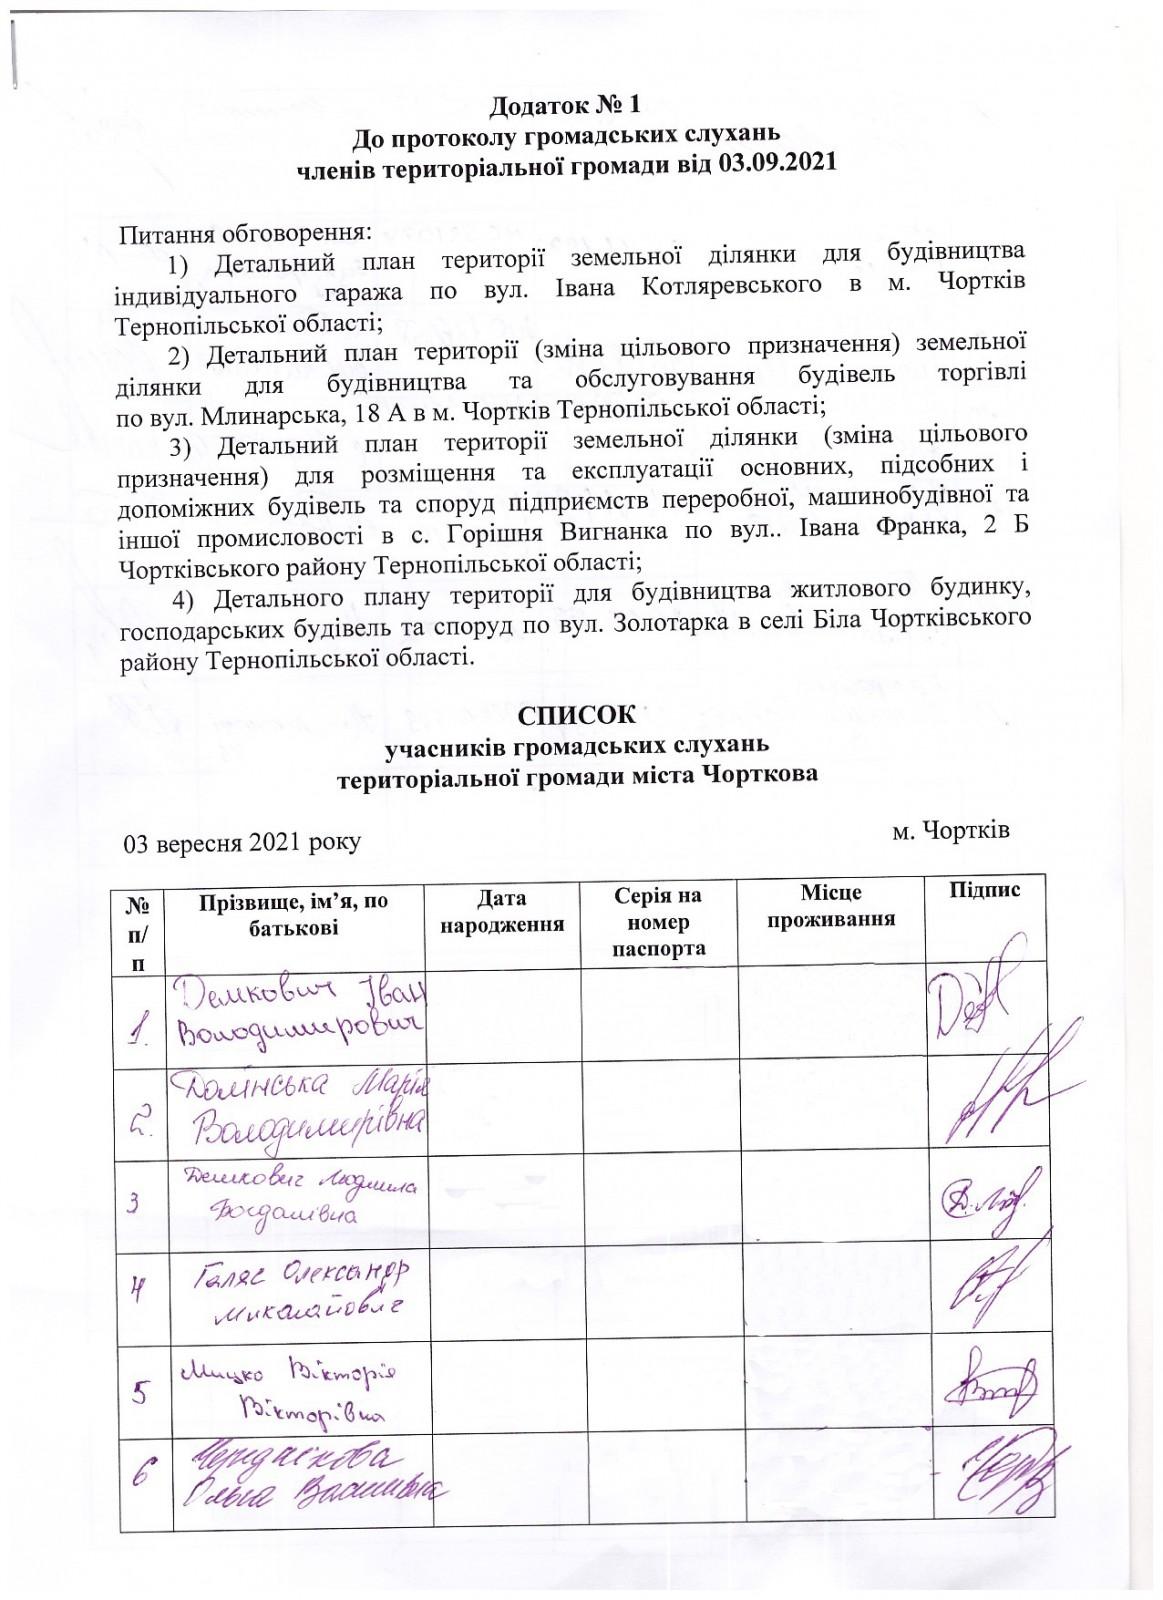 протокол громадських слухань_03-09-2021 (-9